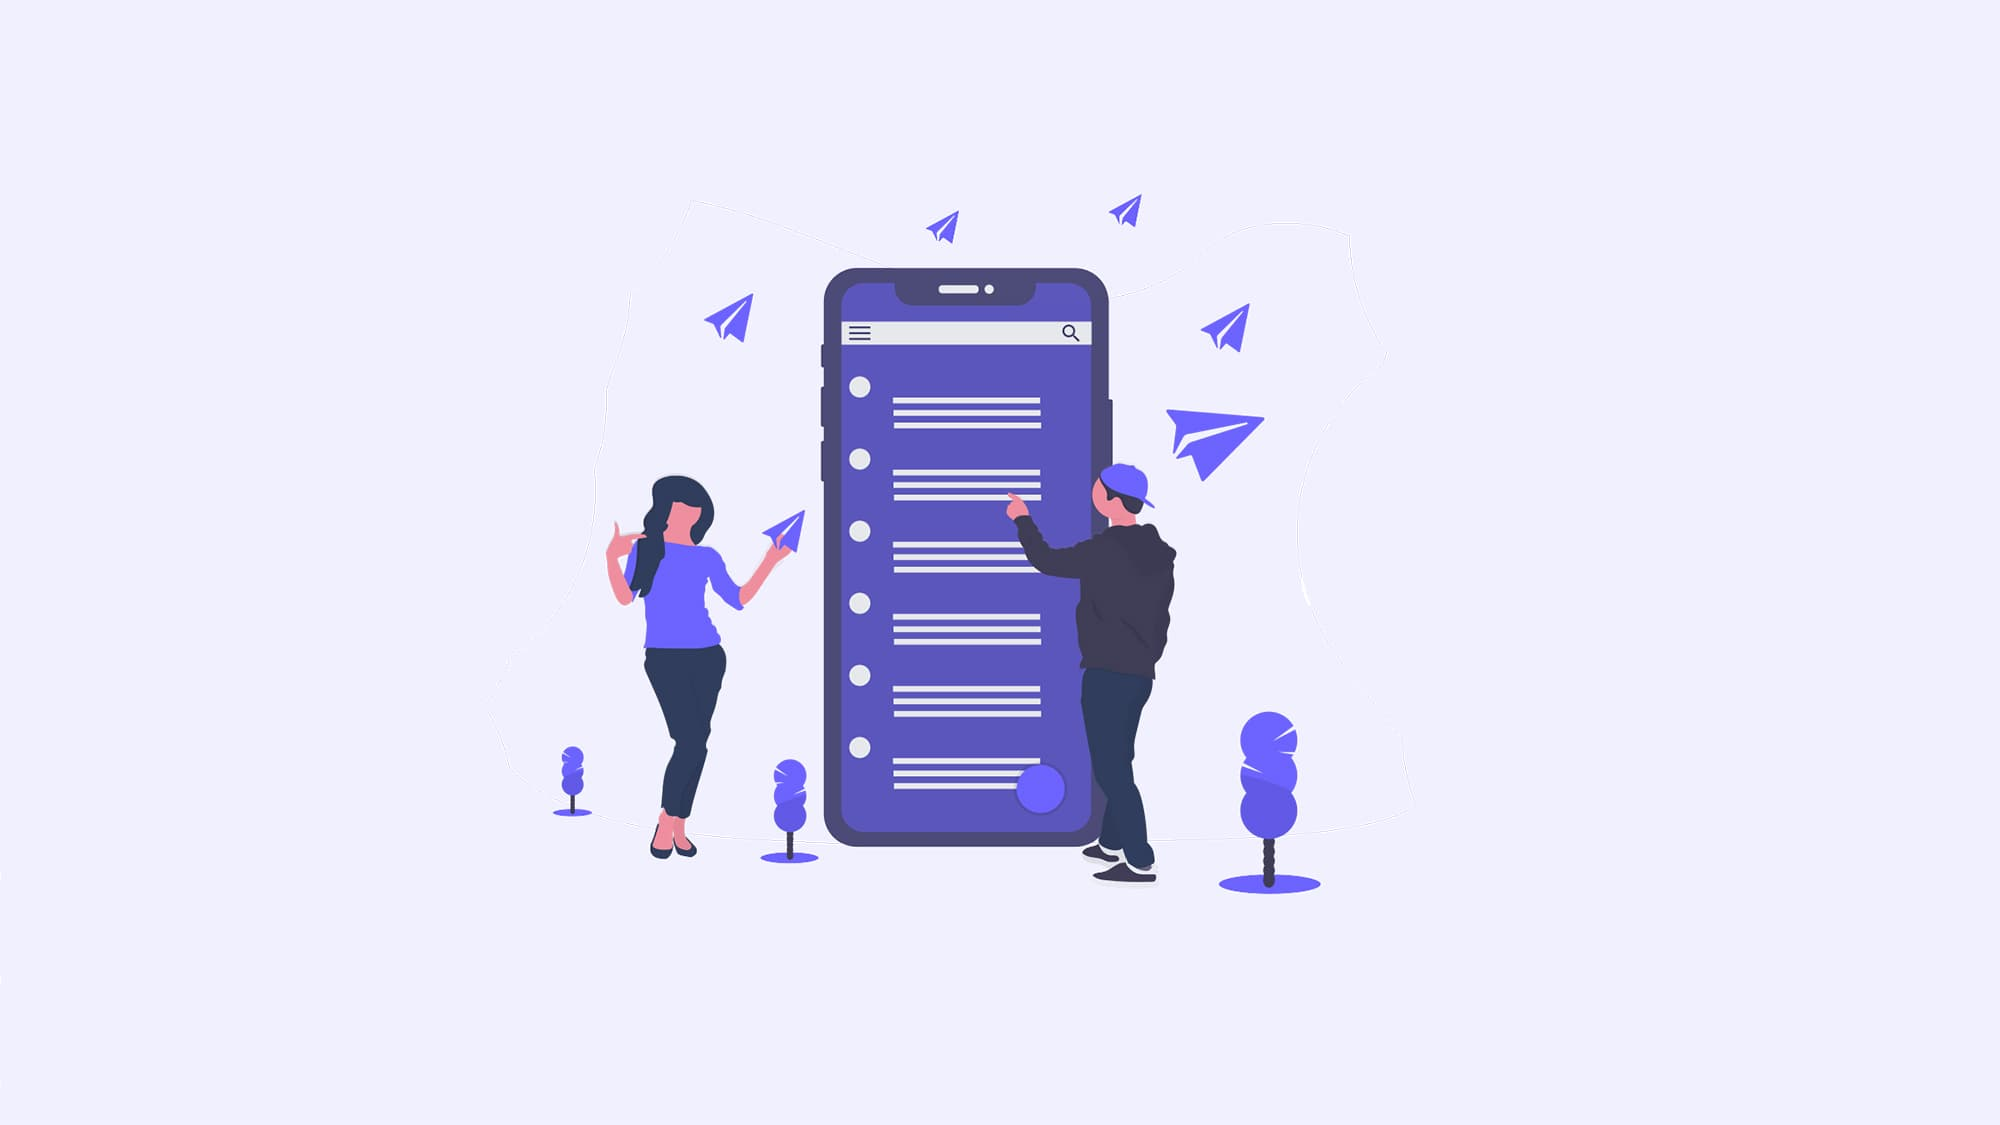 اصول نوشتن پیامک تبلیغاتی